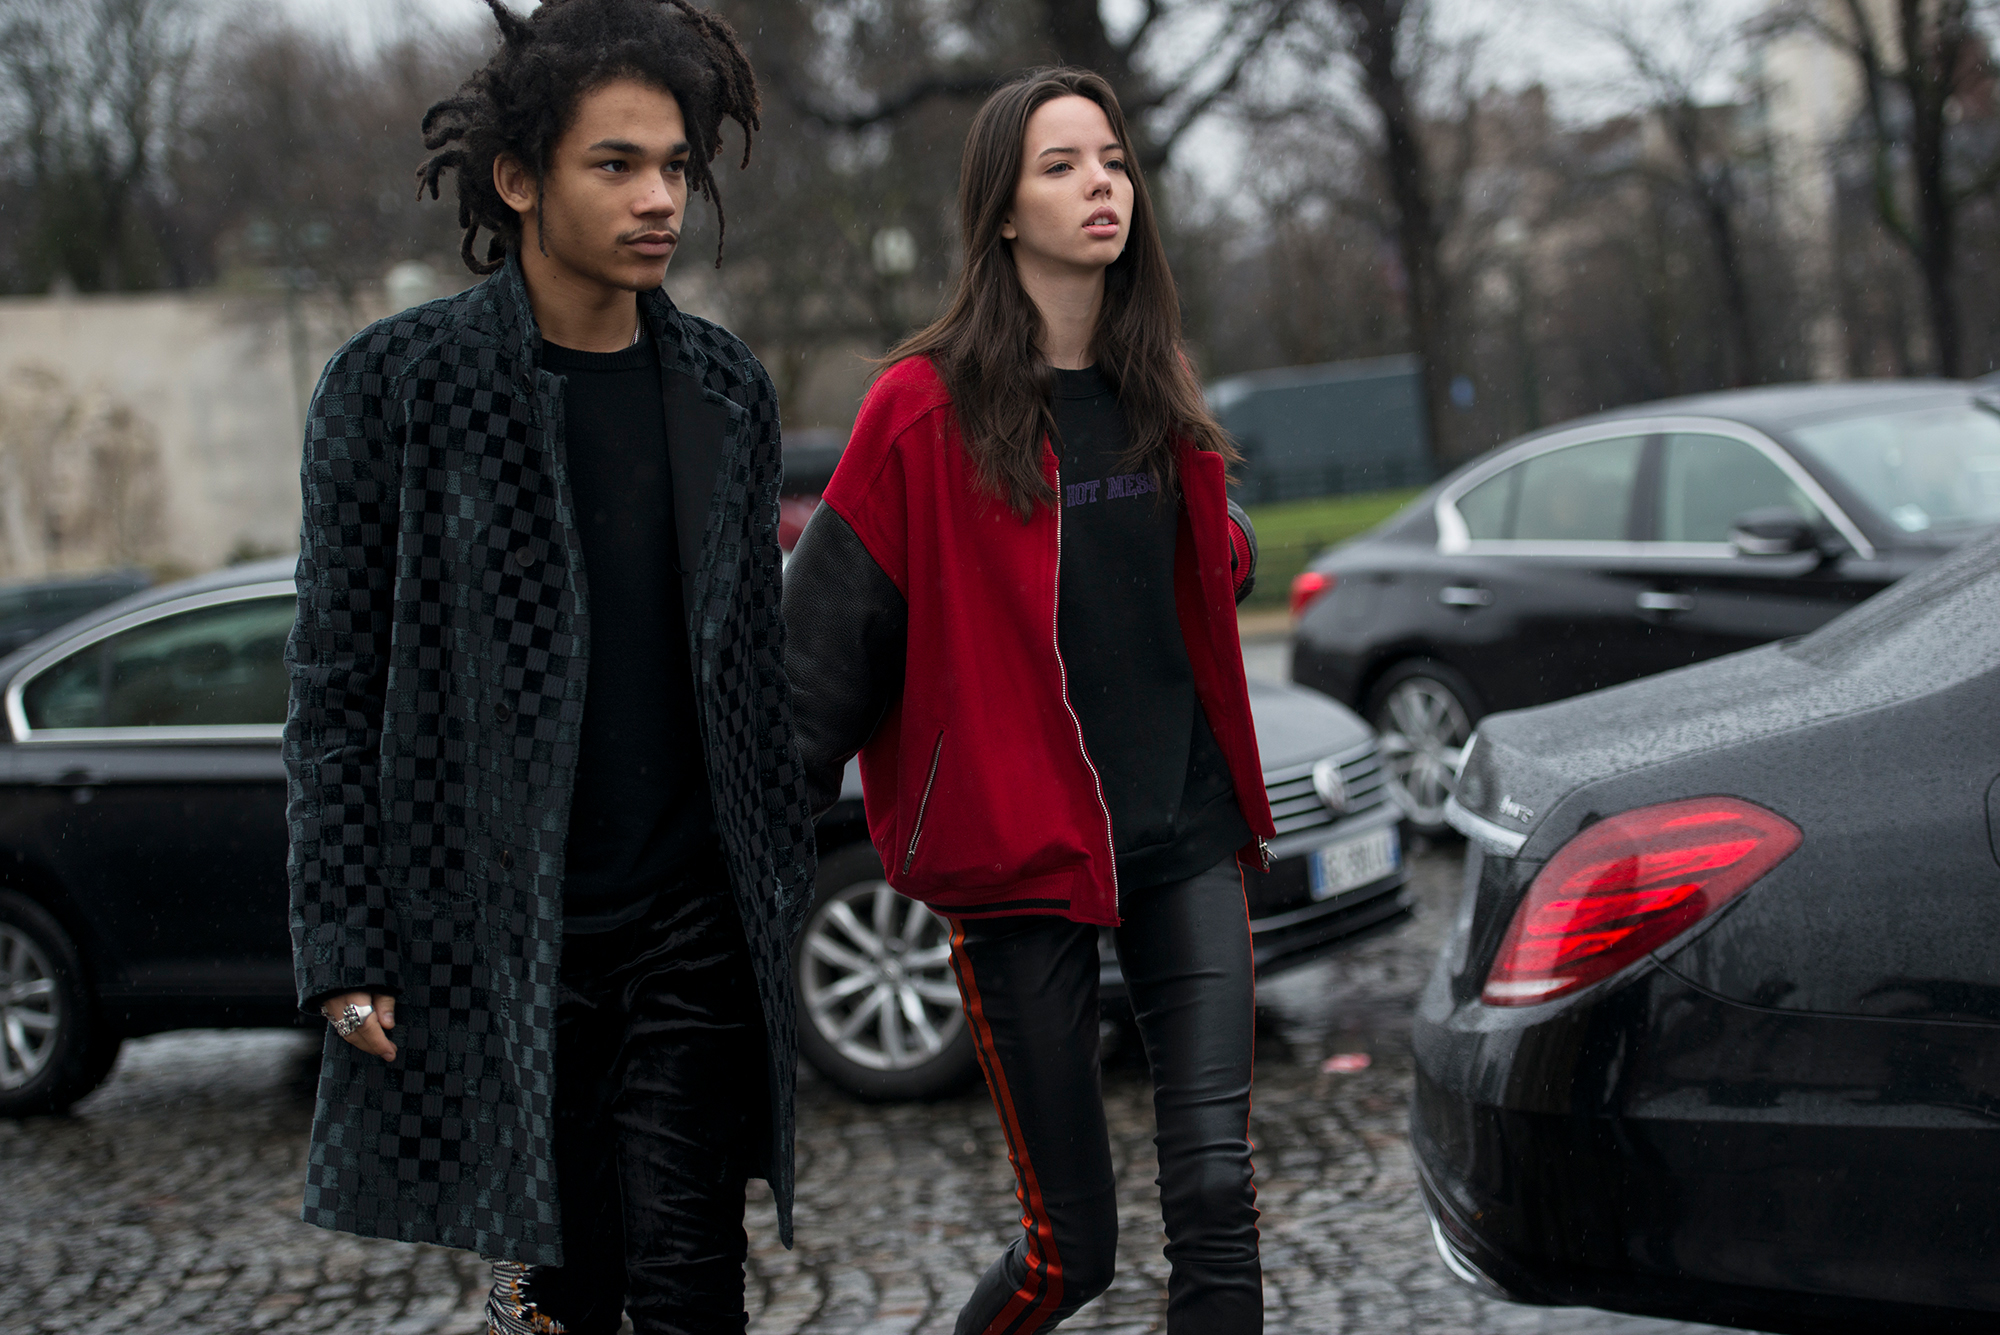 Streetsnaps Paris Fashion Week March 2017 Part 2 - 3747926